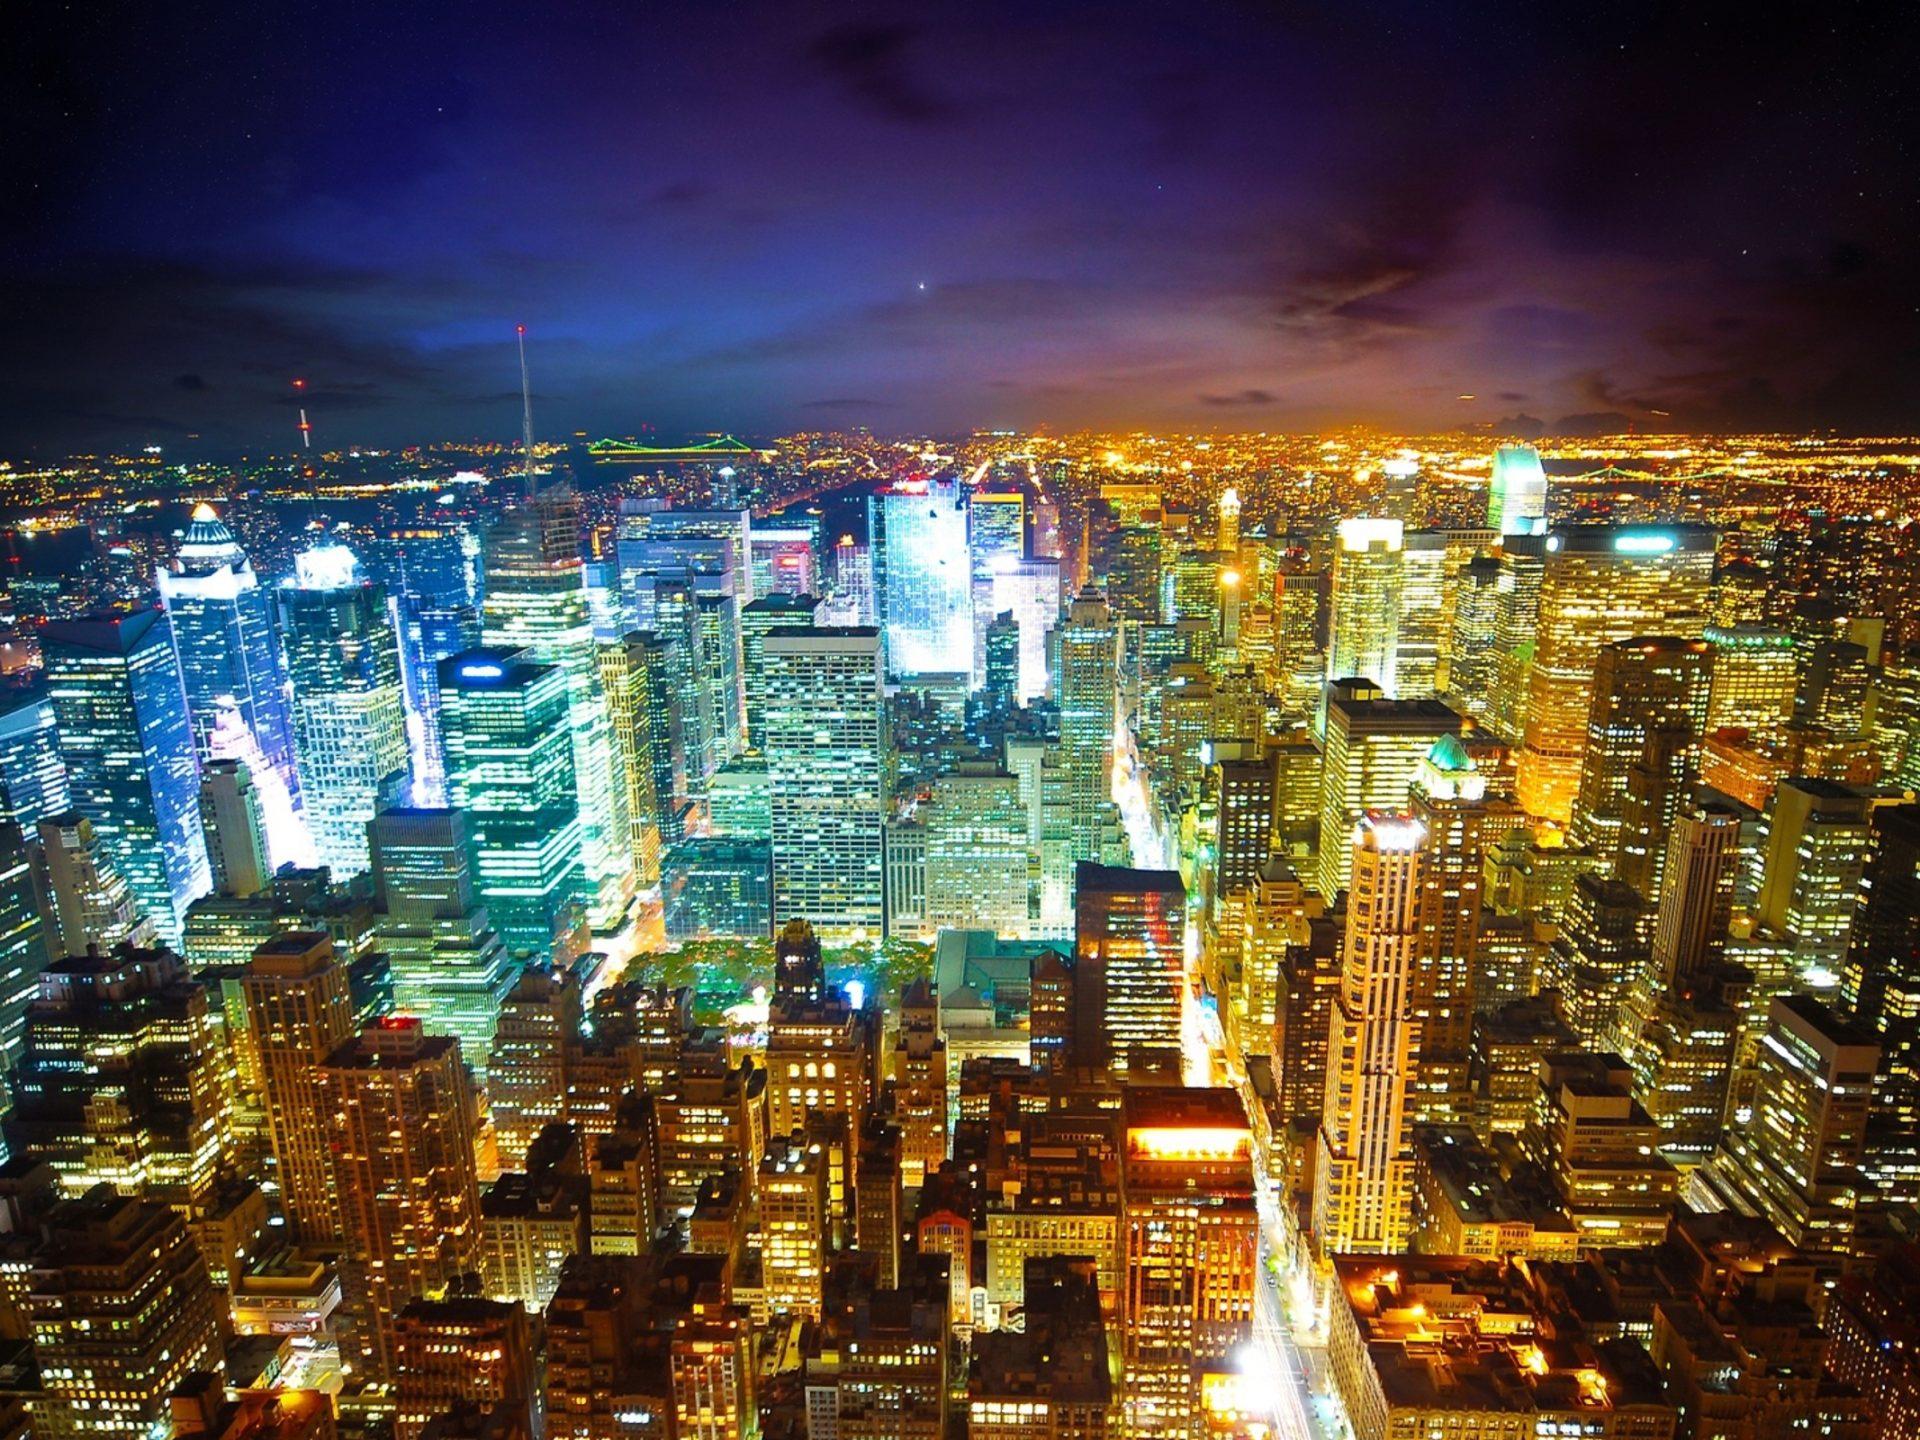 Iphone X New York City Wallpaper New York City Iphone Wallpaper Hd